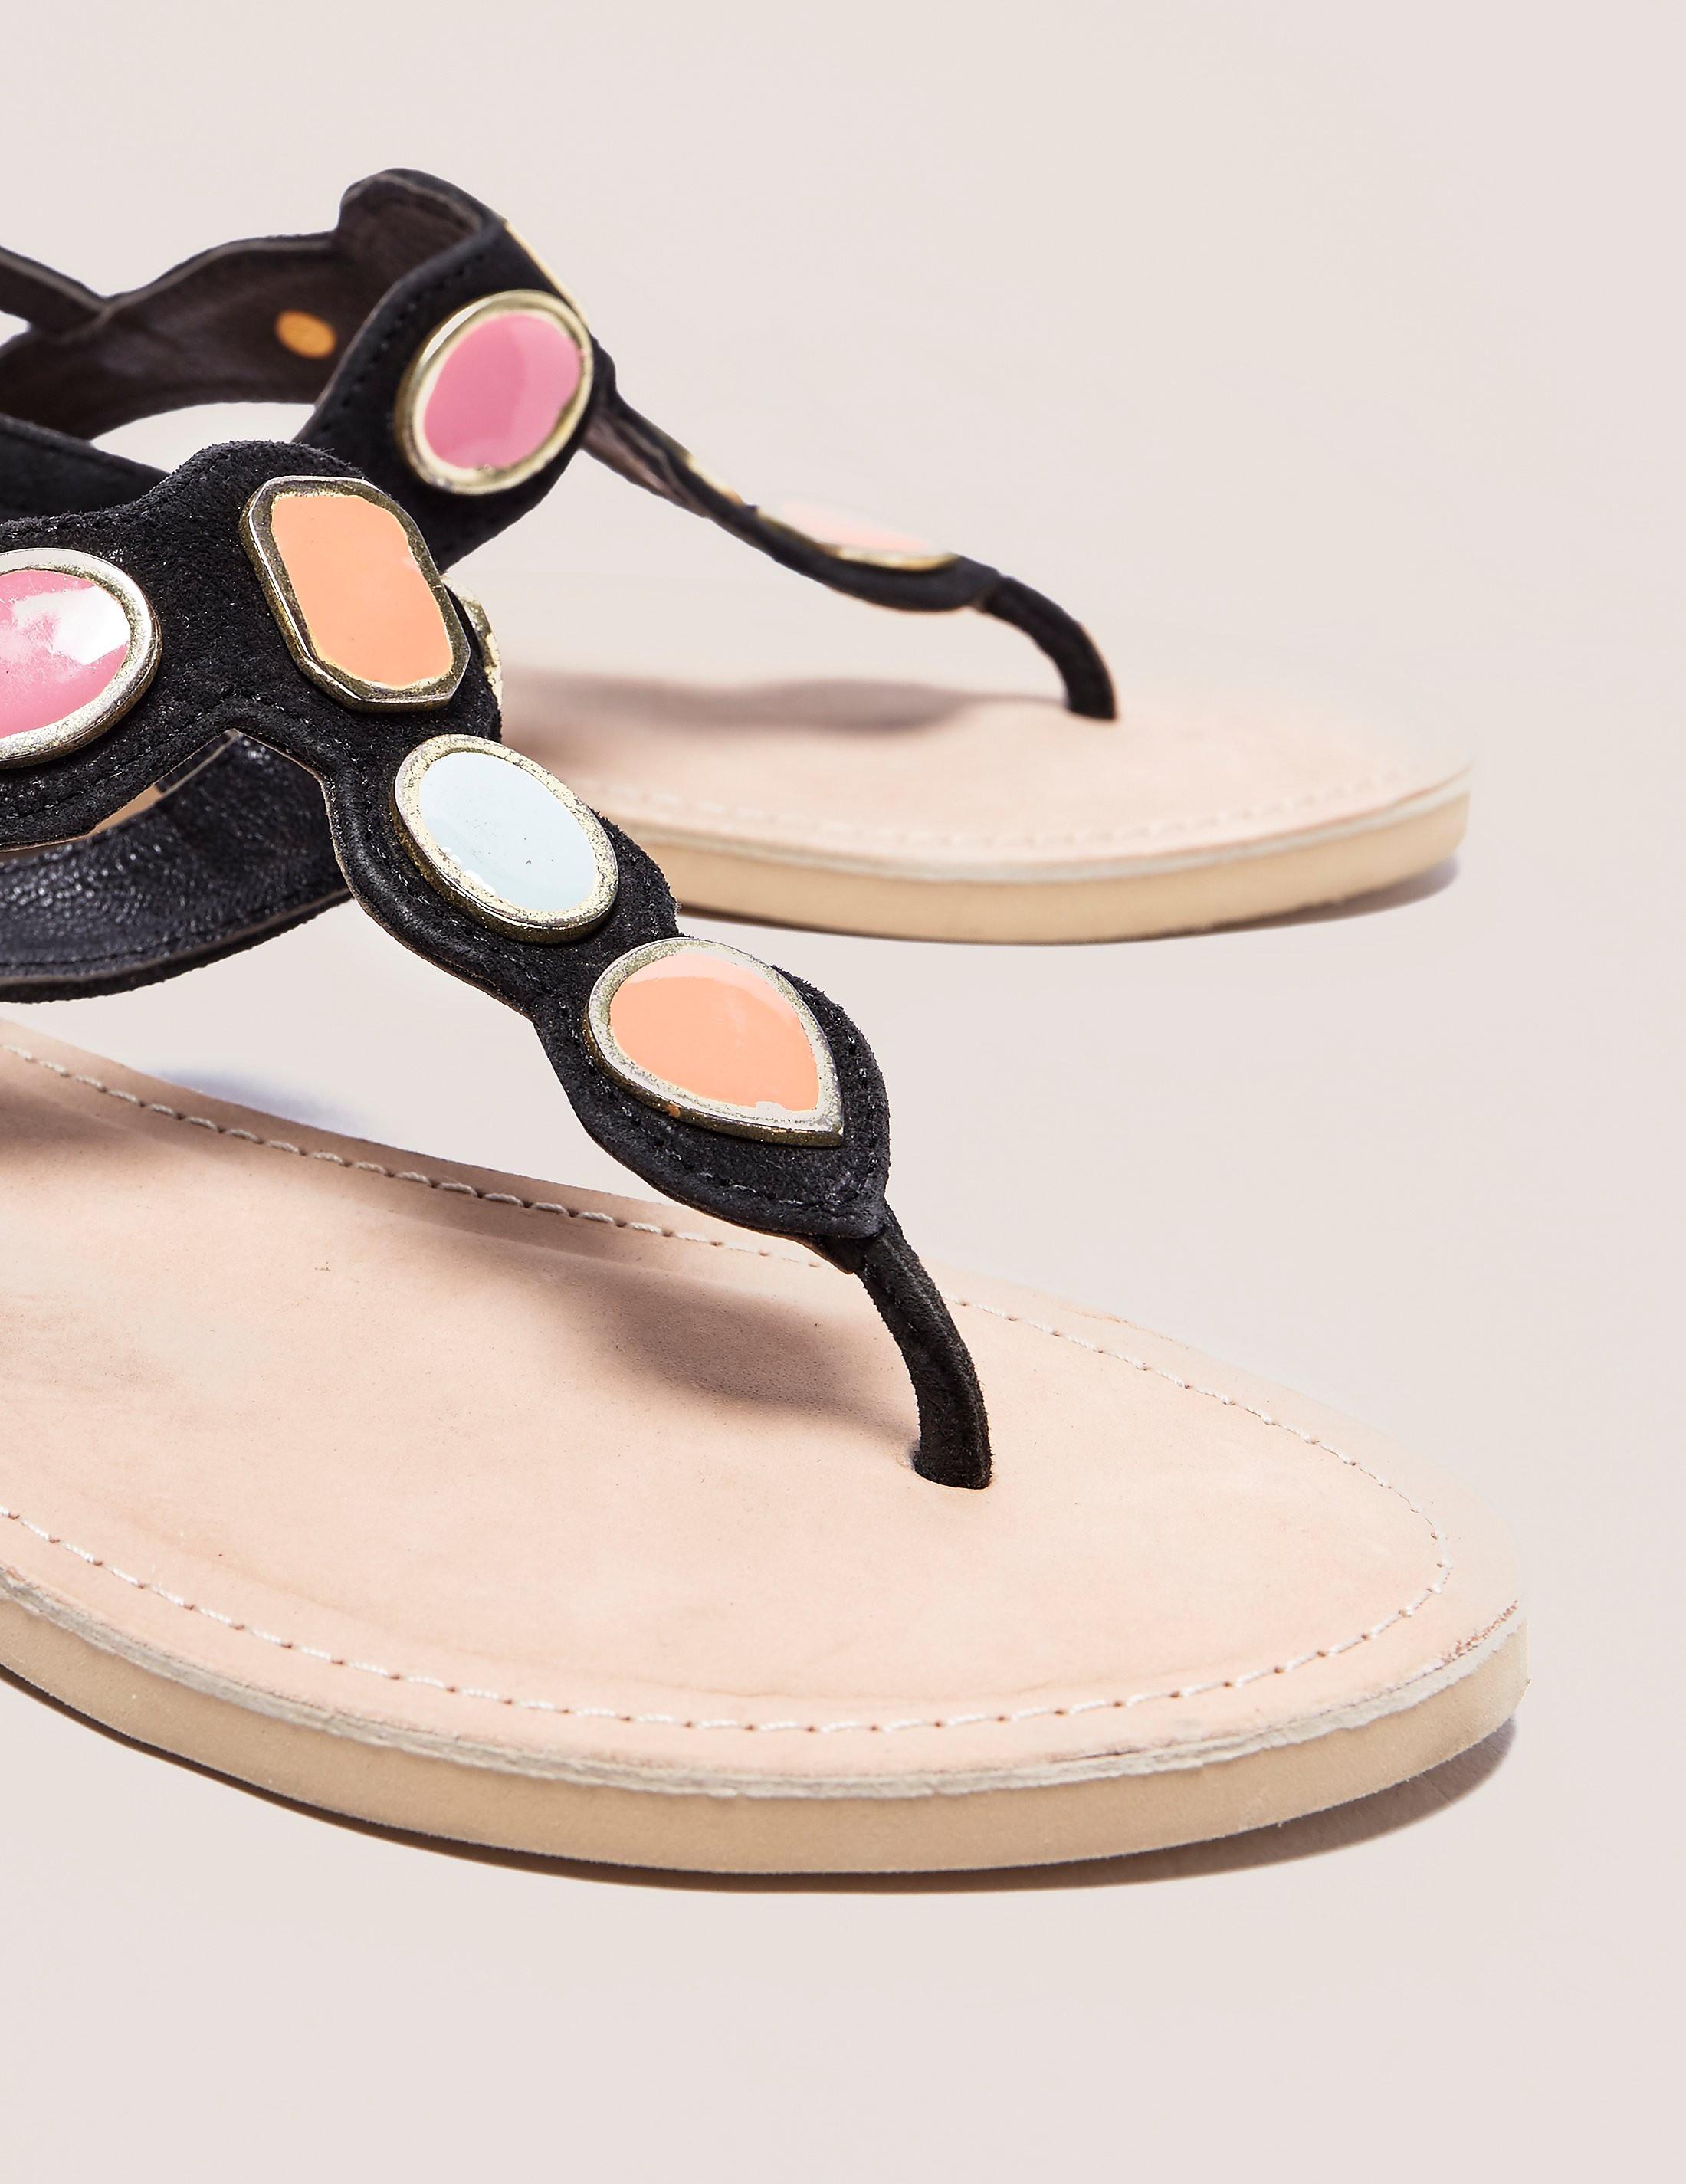 Ilse Jacobsen Suede Sandals